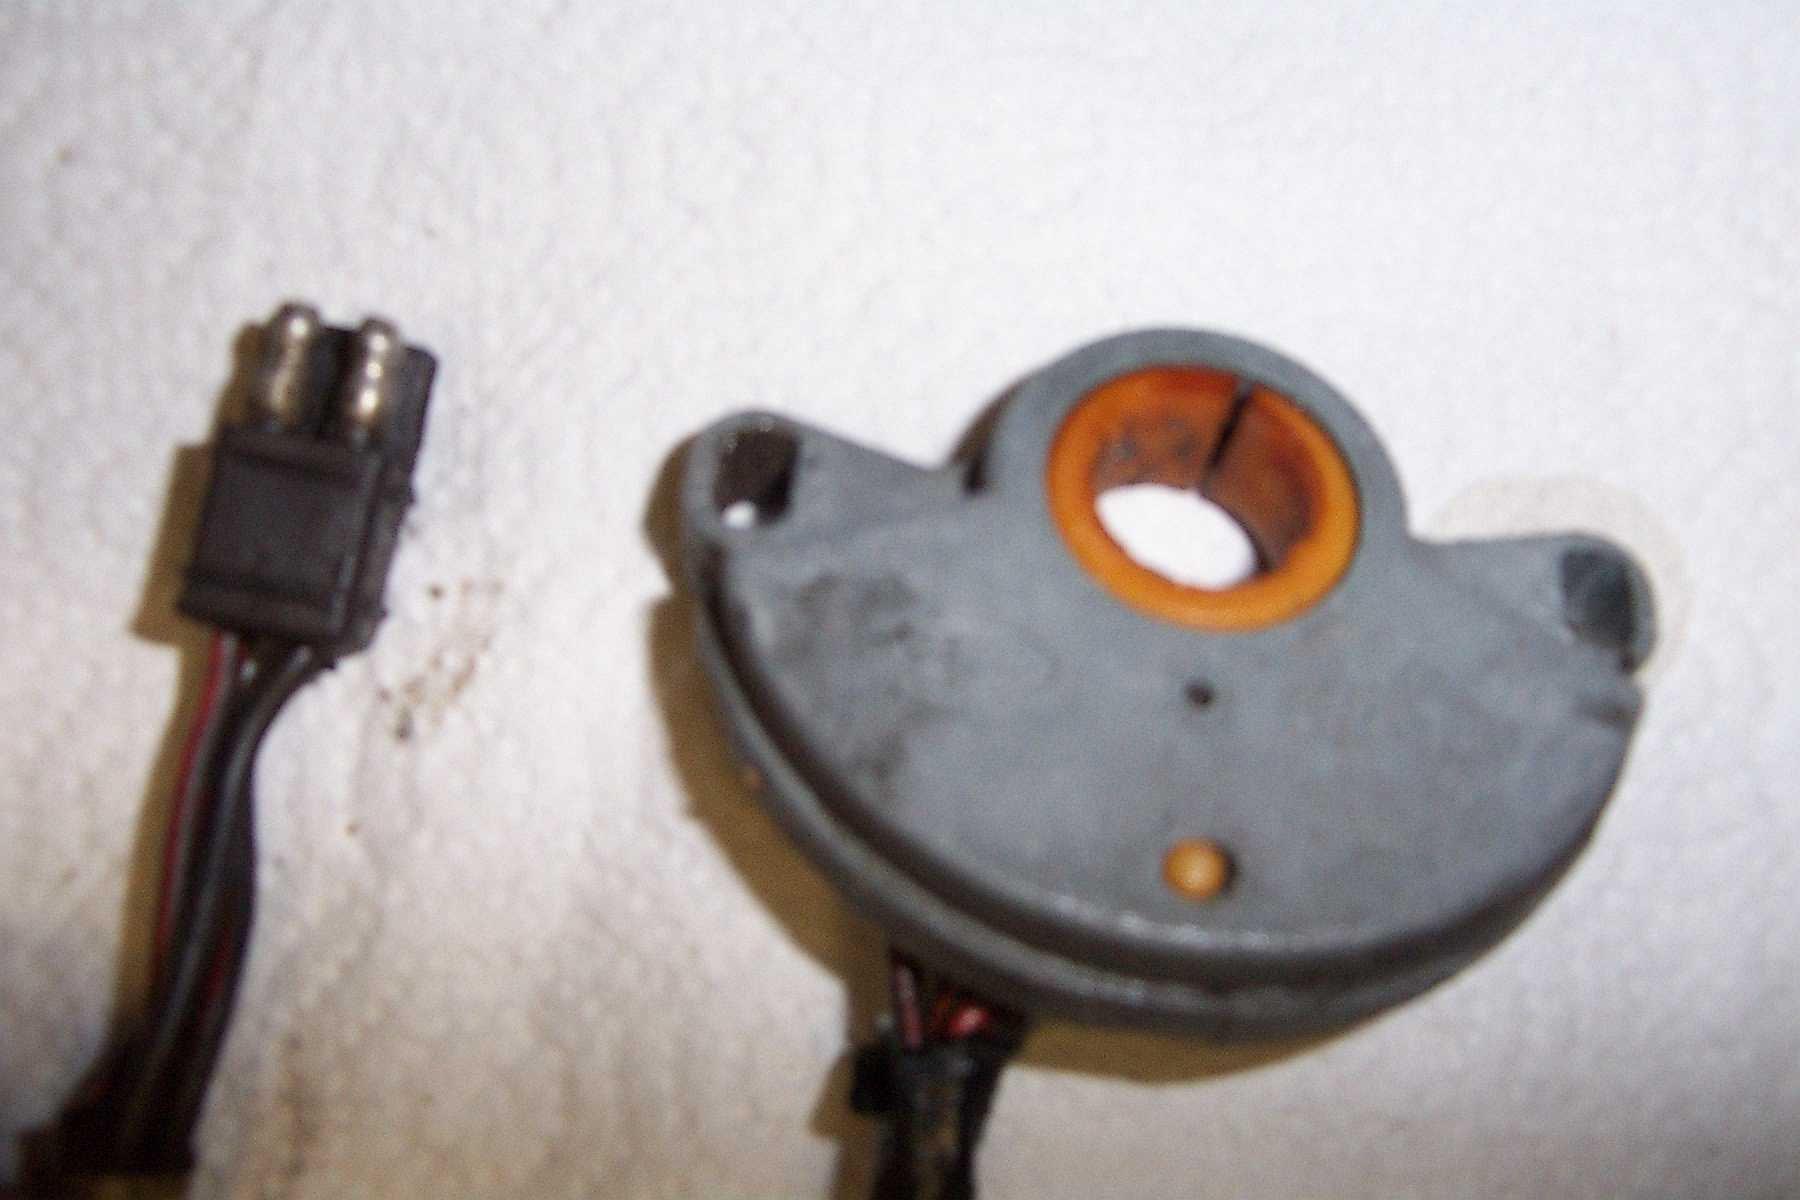 Neutral Safety Switch - C4